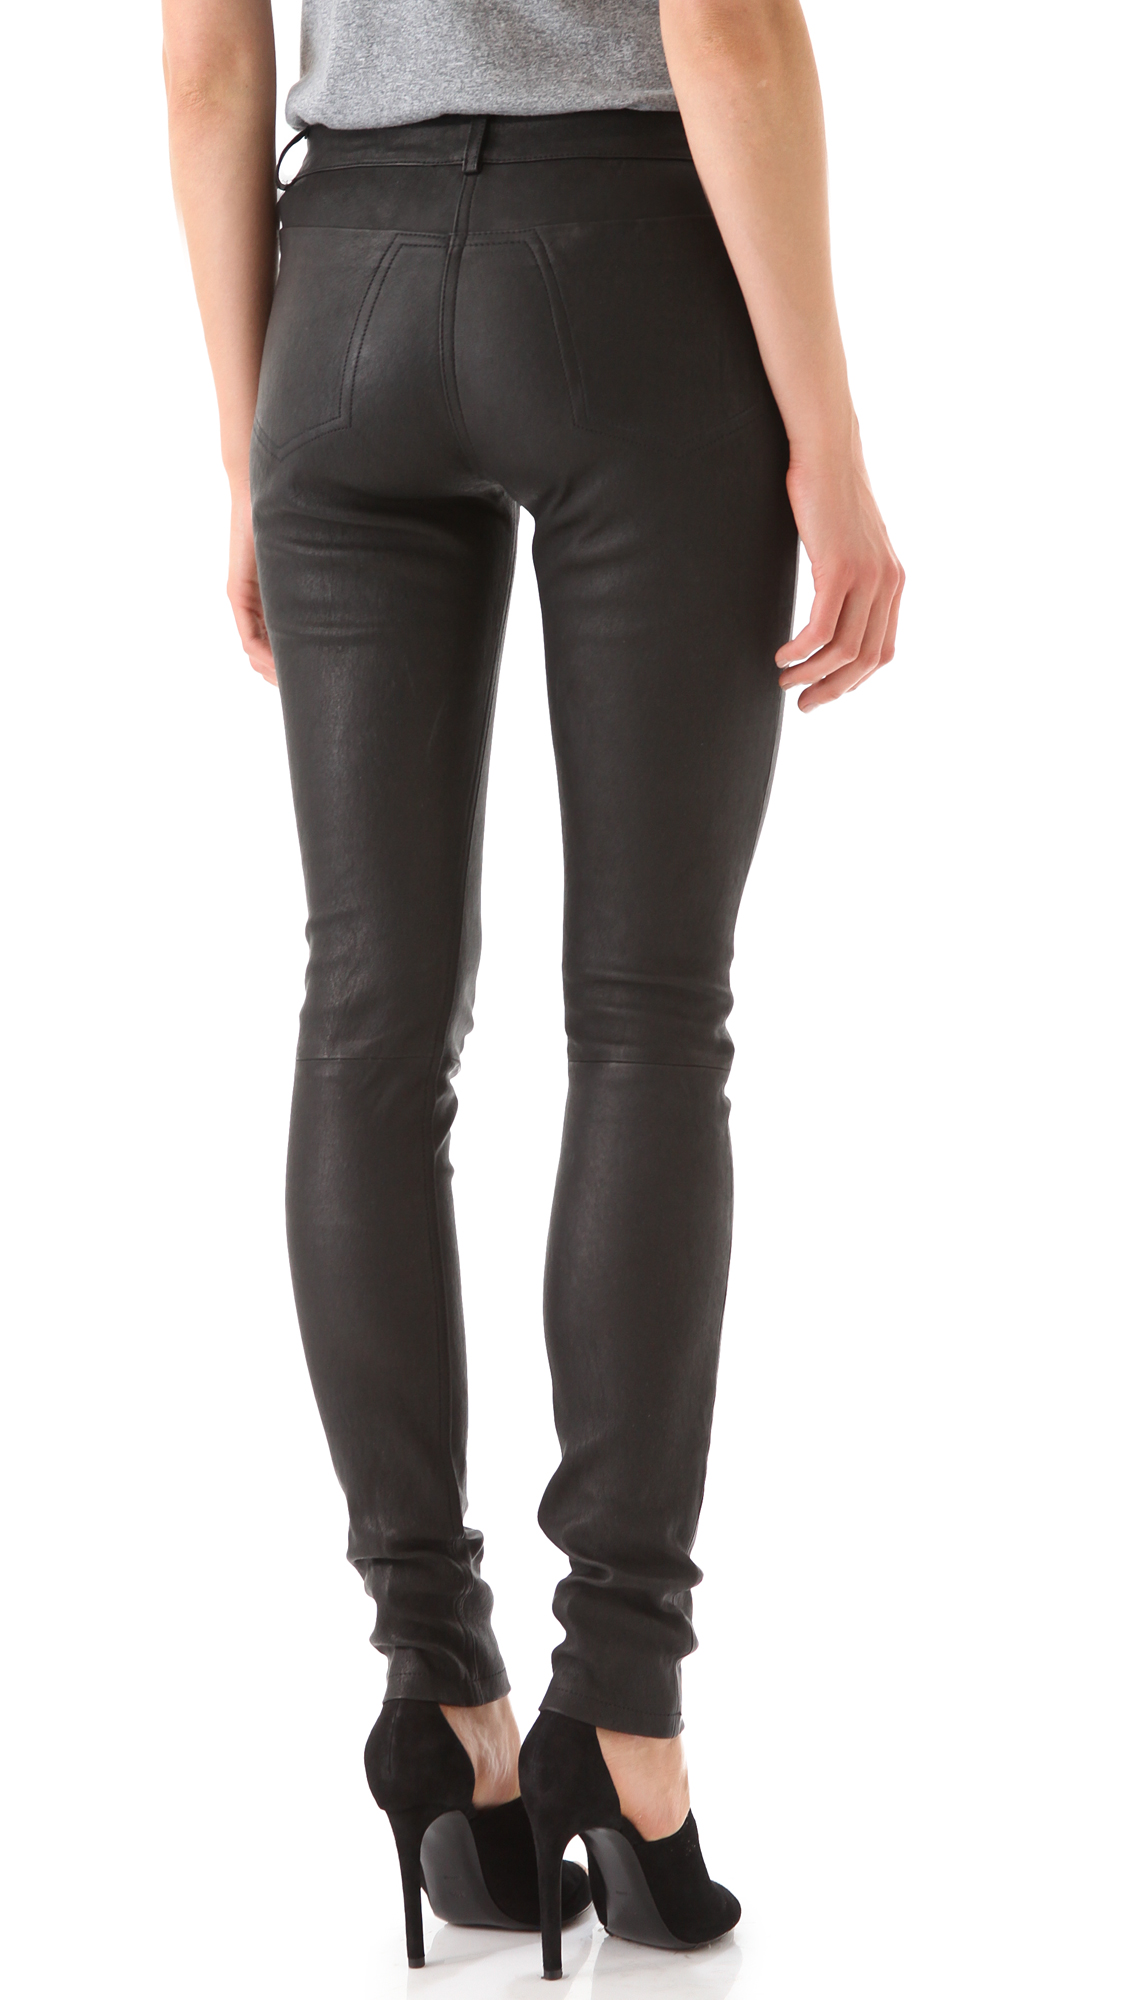 c43af16a60f8 alexanderwang.t Stretch Leather Pants